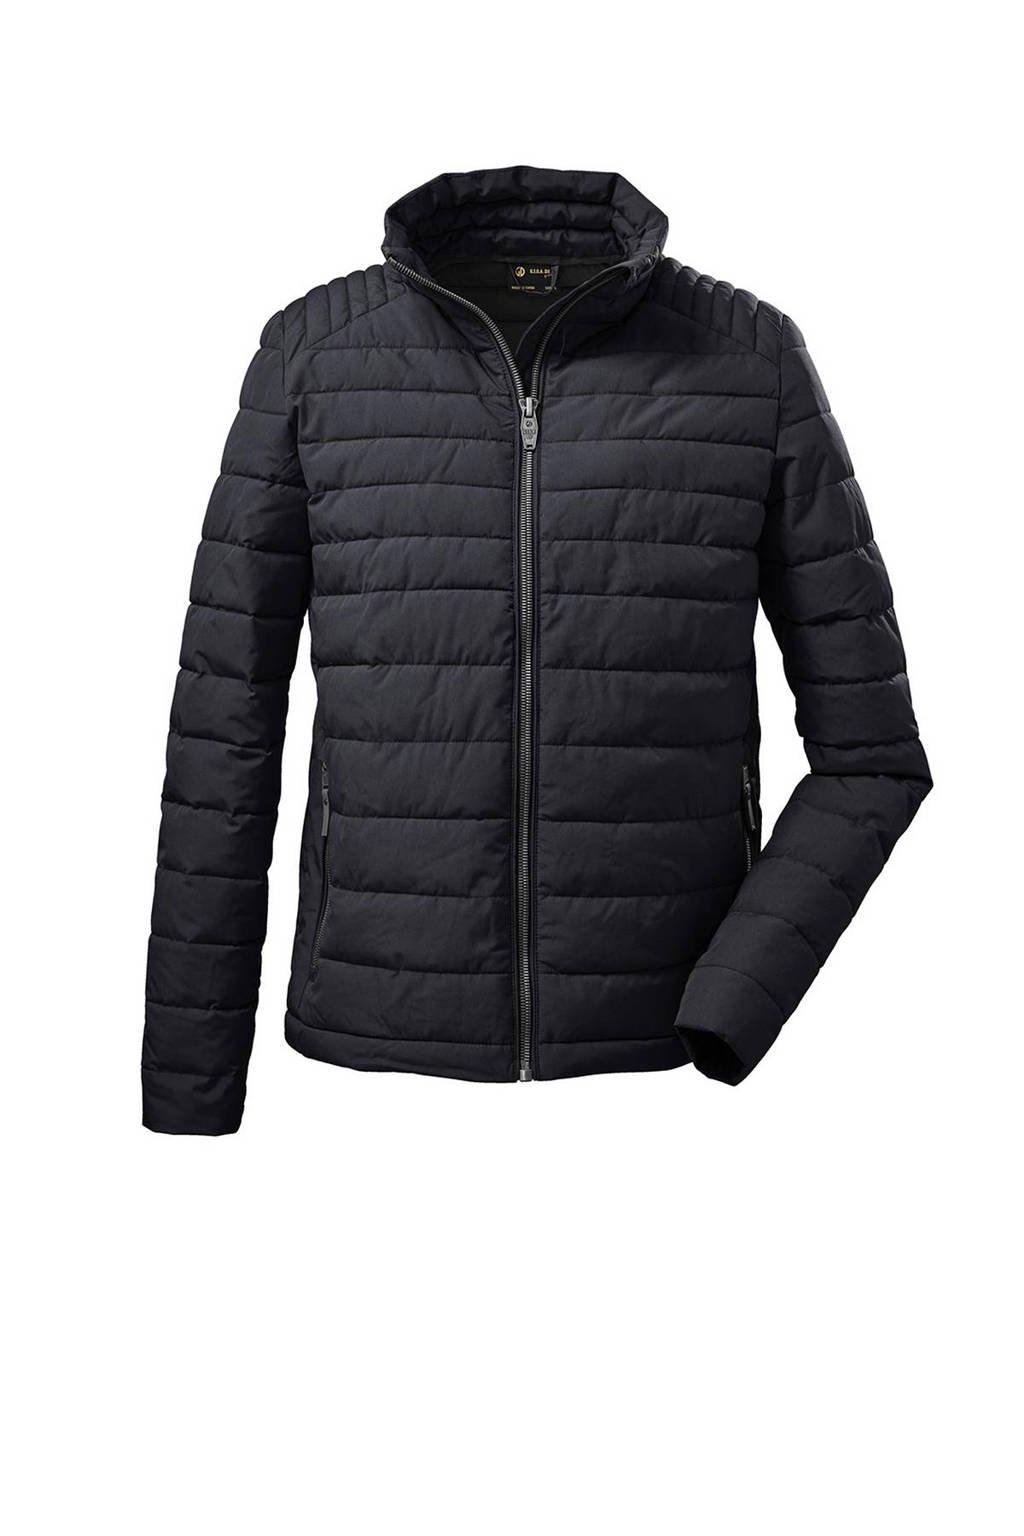 Killtec outdoor jas GW 40 donkerblauw, Donkerblauw